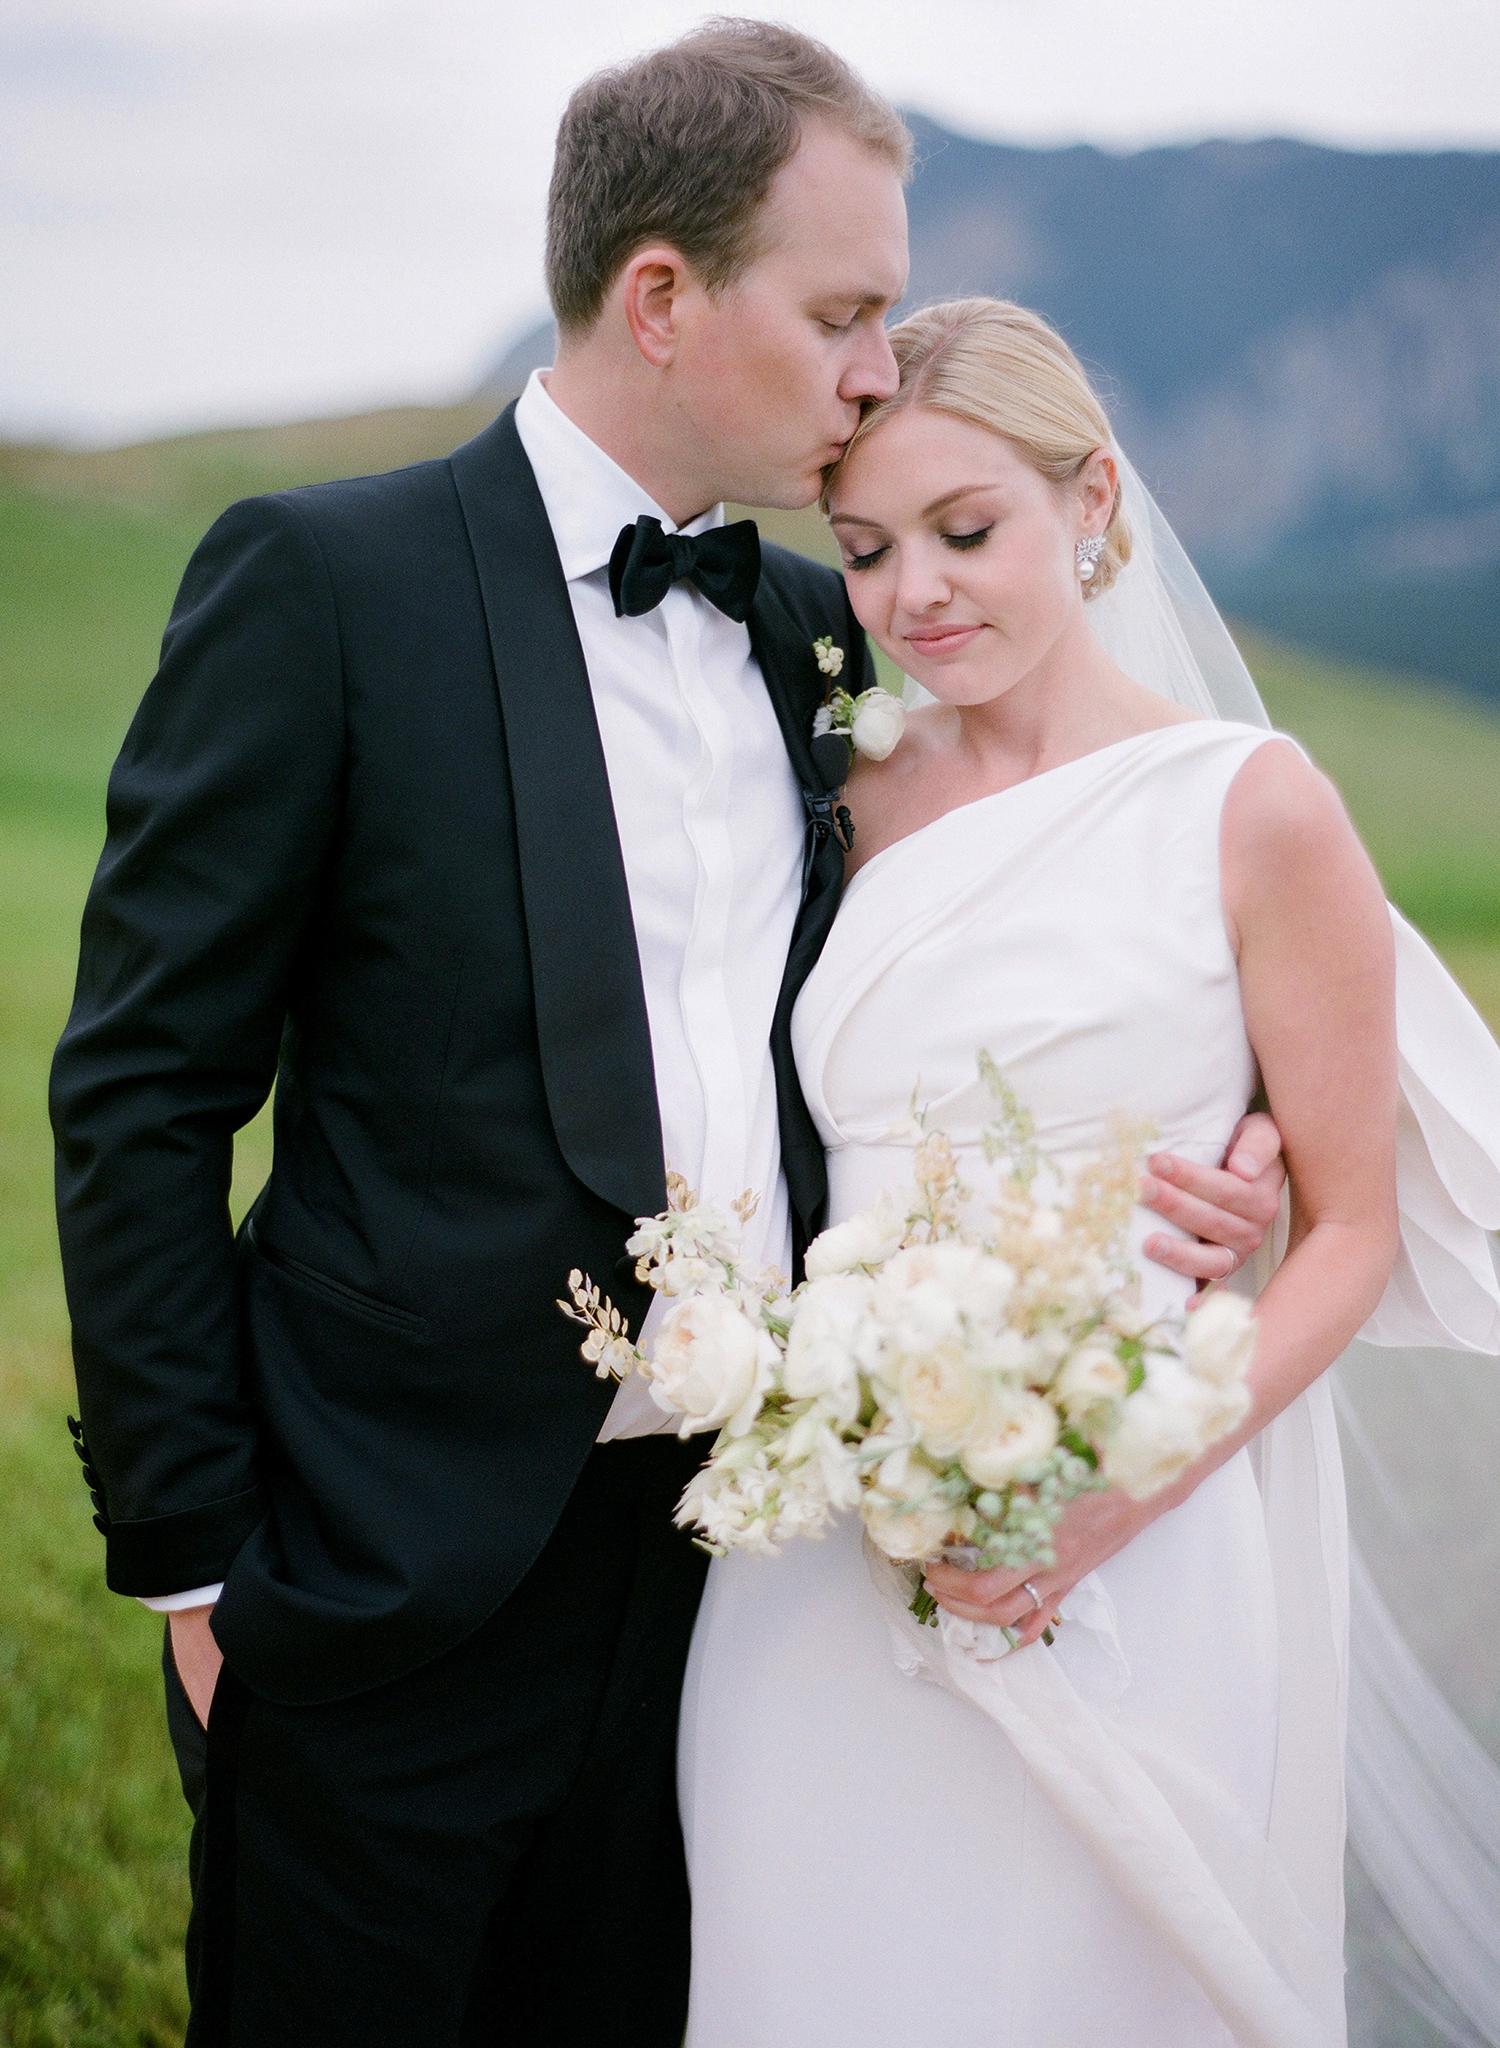 sloan scott wedding couple hugging